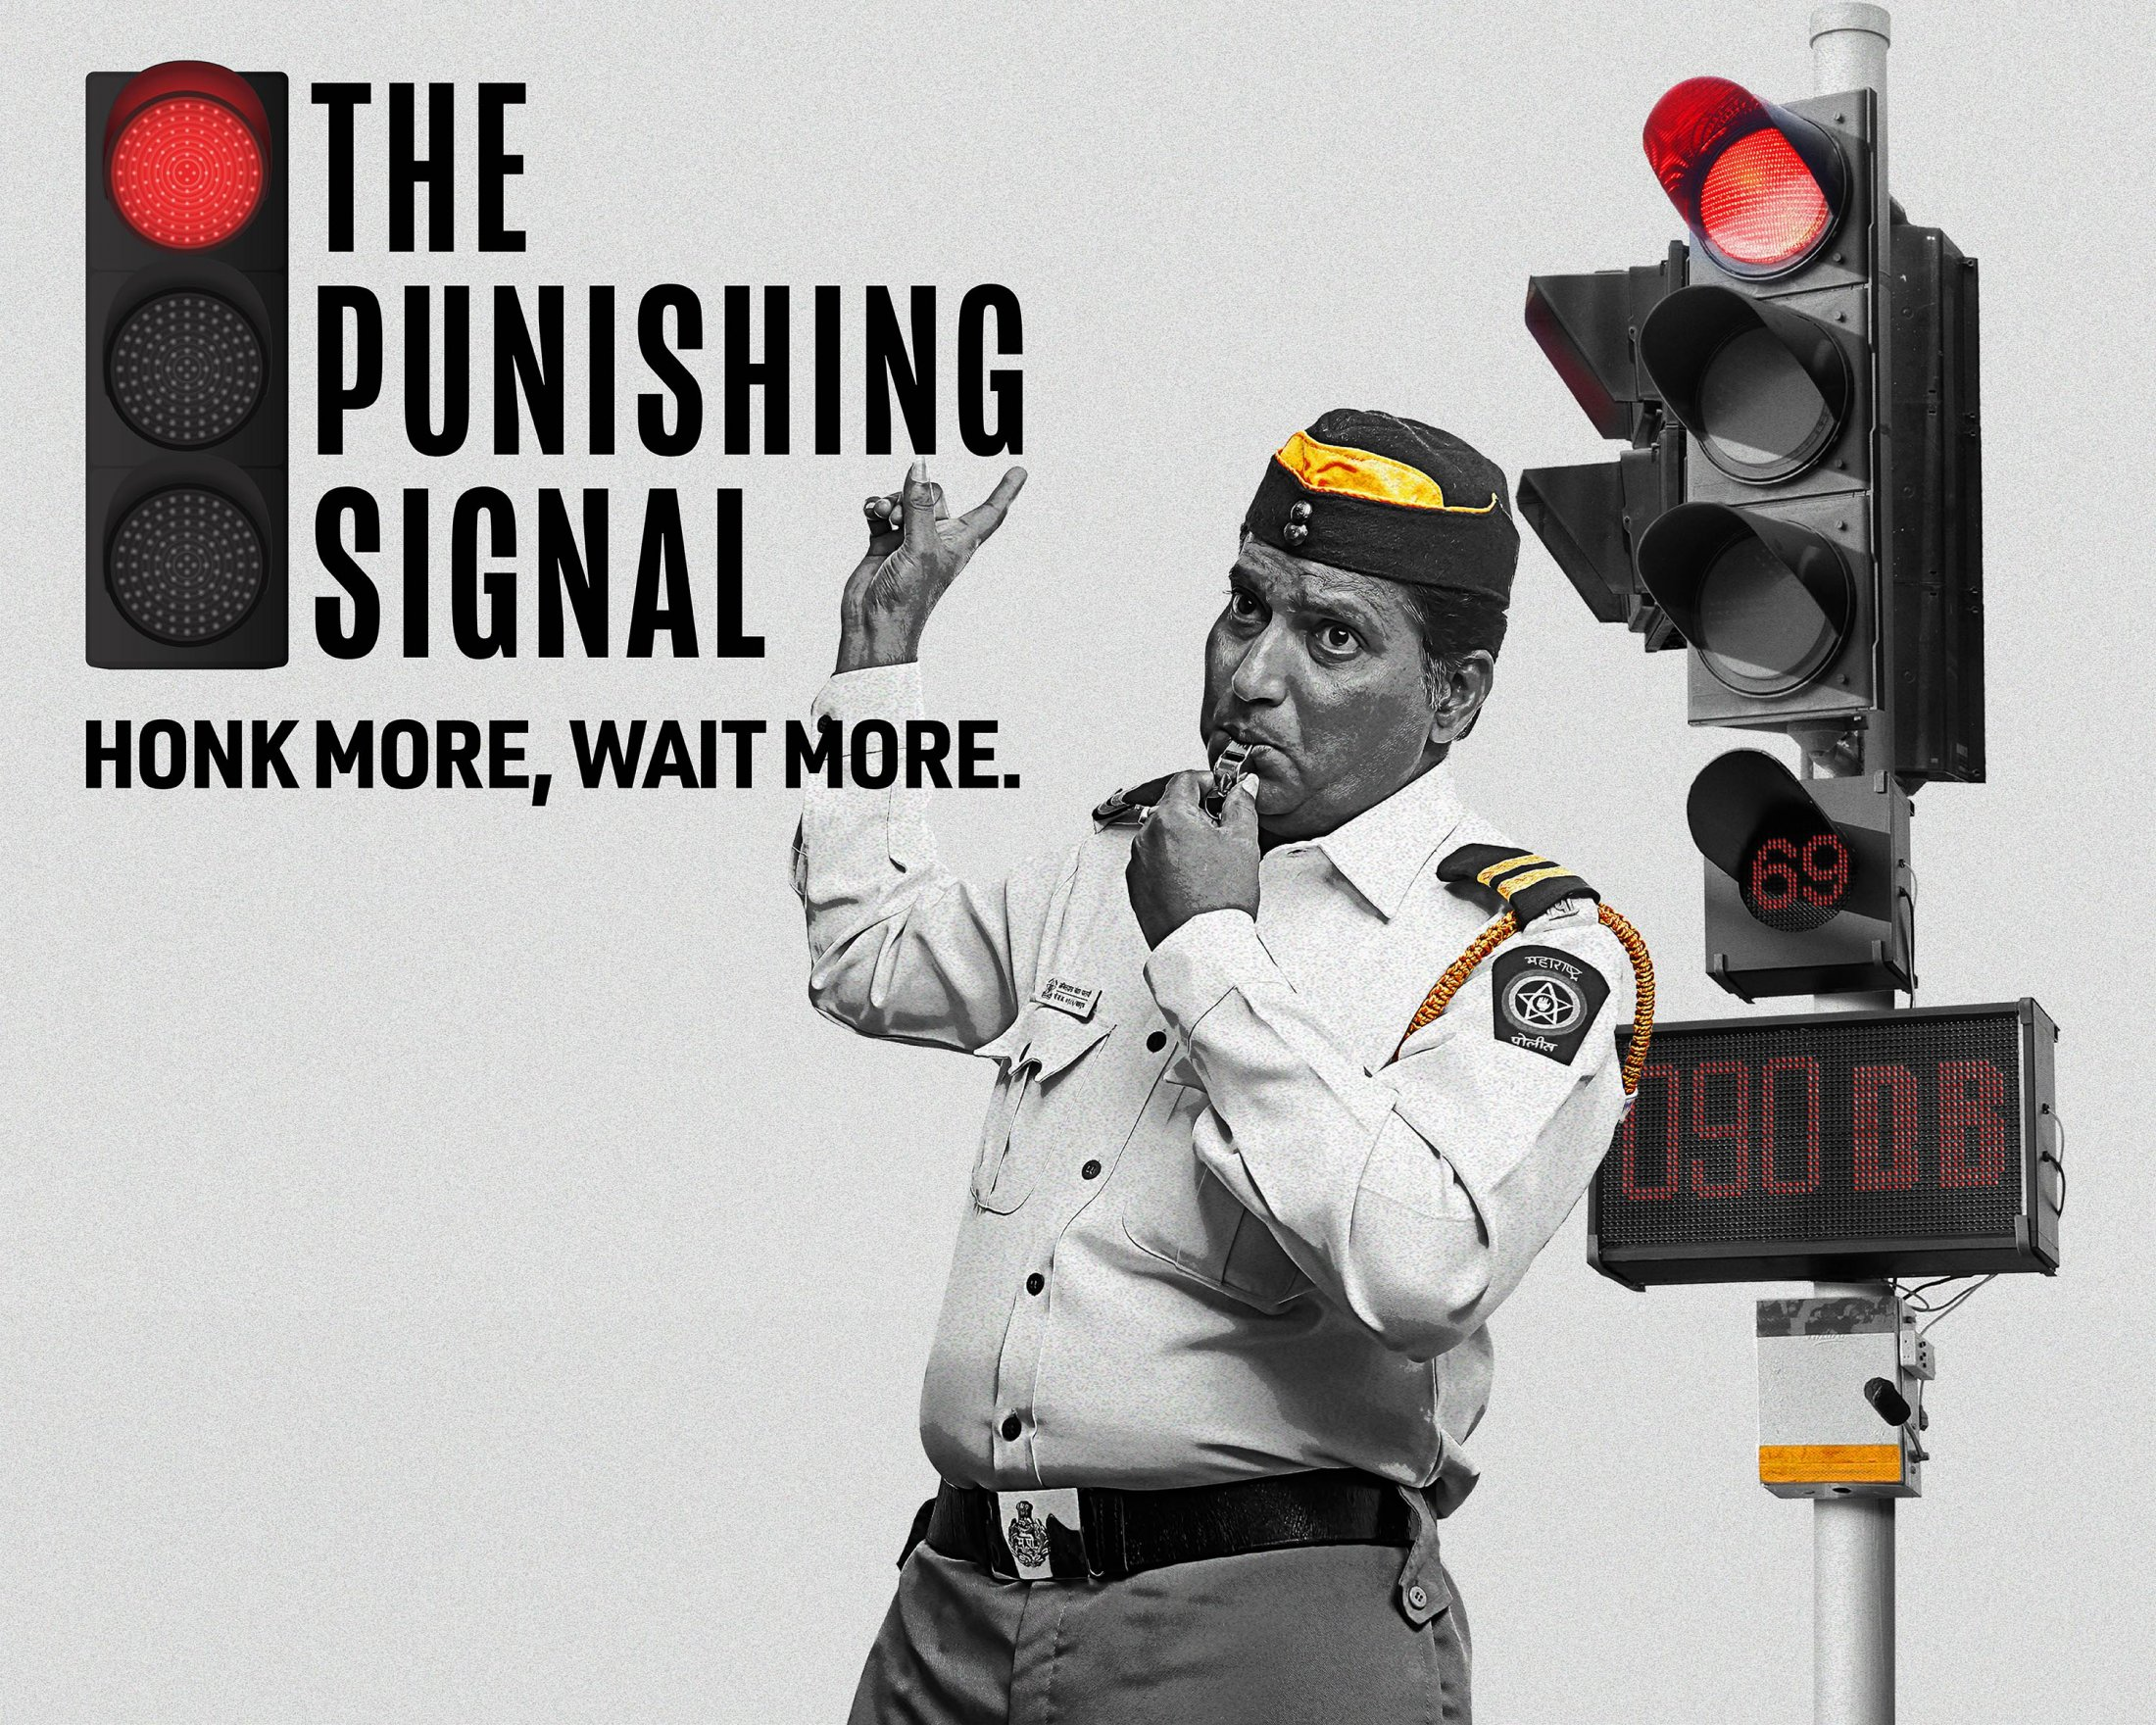 Thumbnail for The Punishing Signal